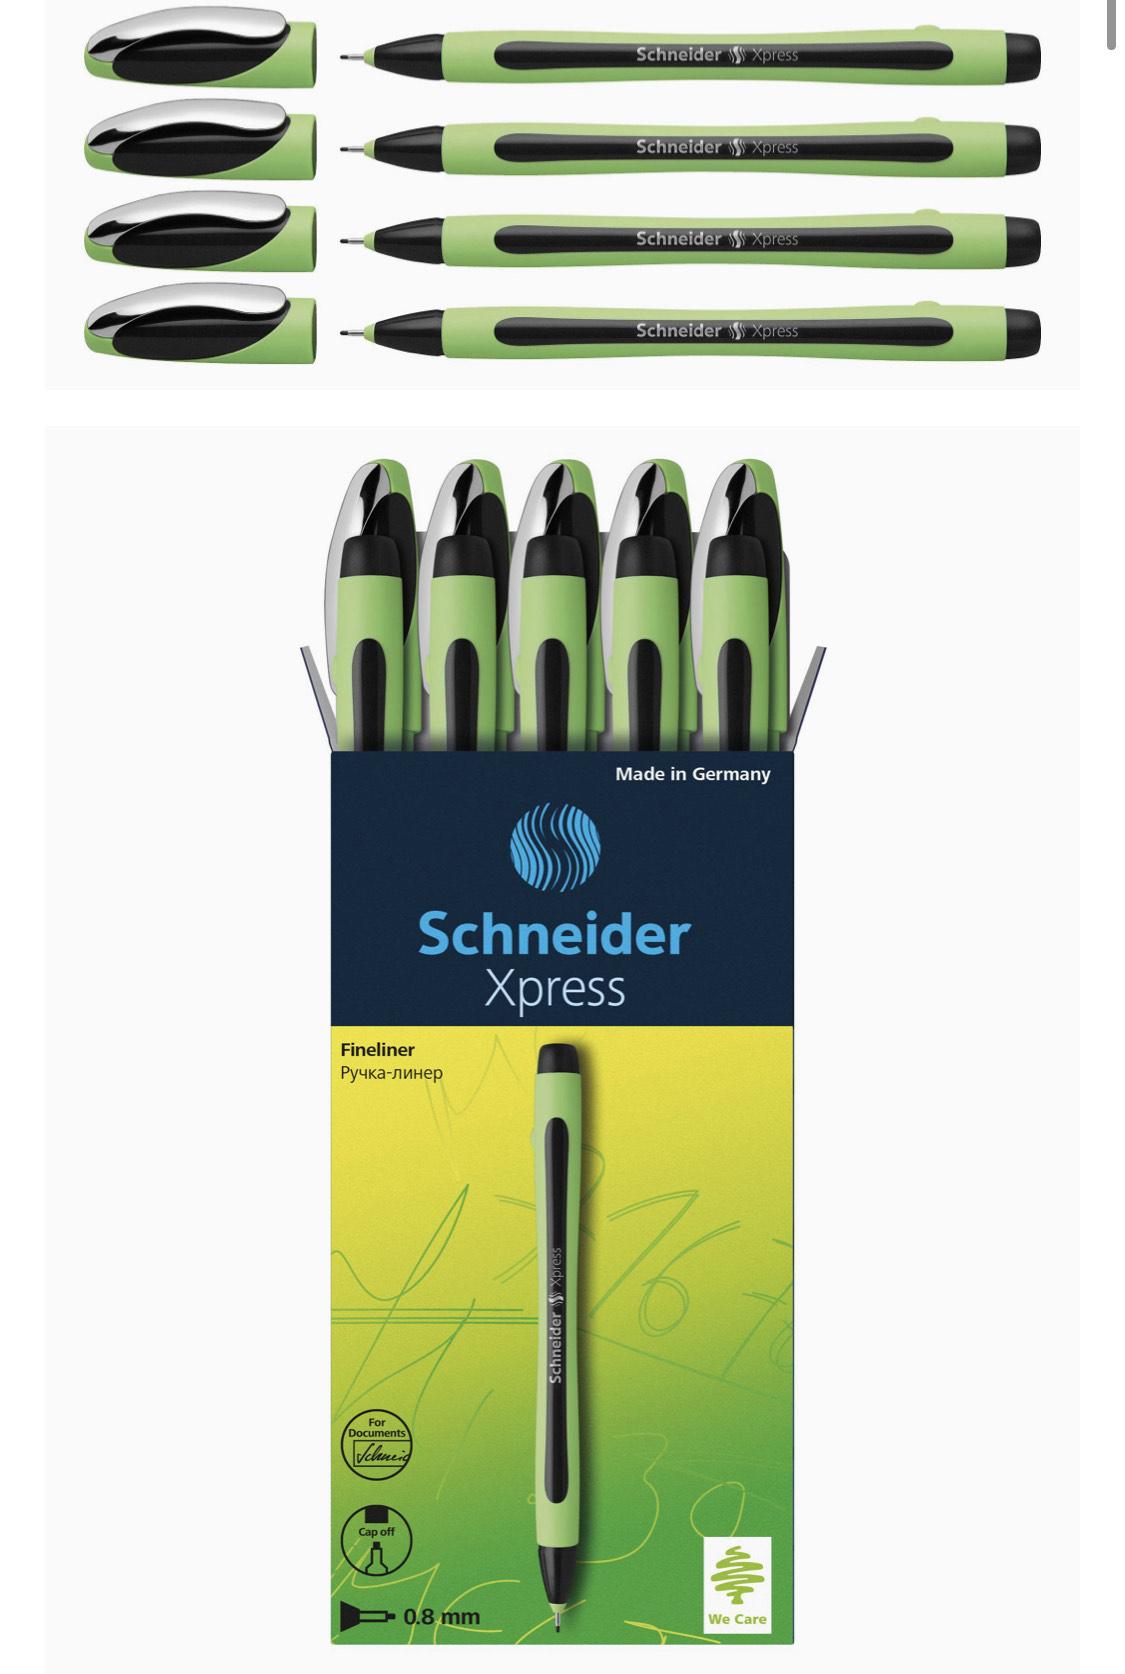 [Prijsfout] 10x Schneider Xpress 0,8mm Fineliner (inkt onuitwisbaar)